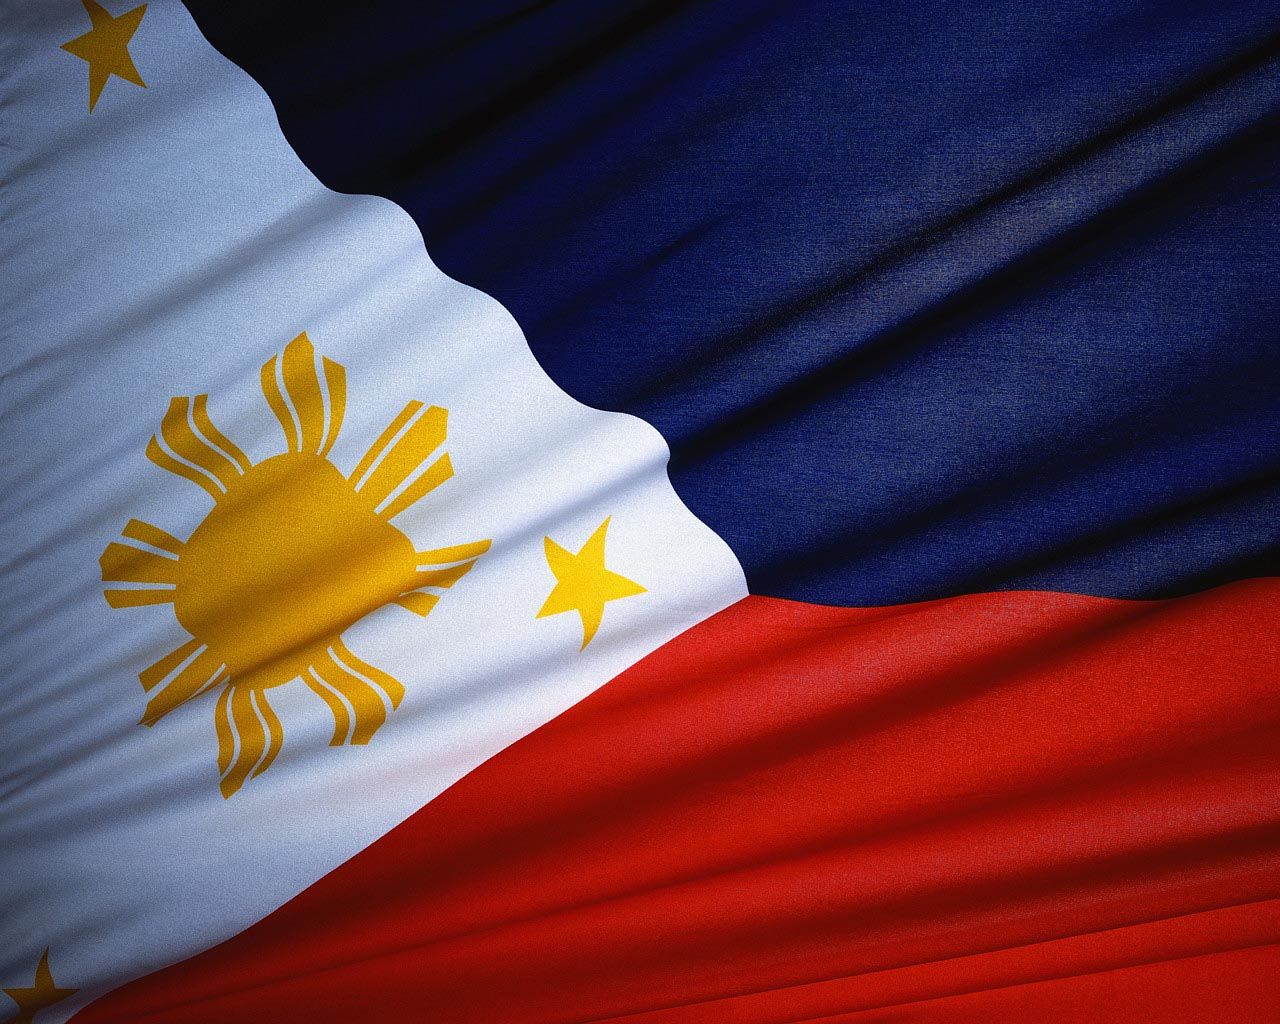 Photo of the Philippine flag